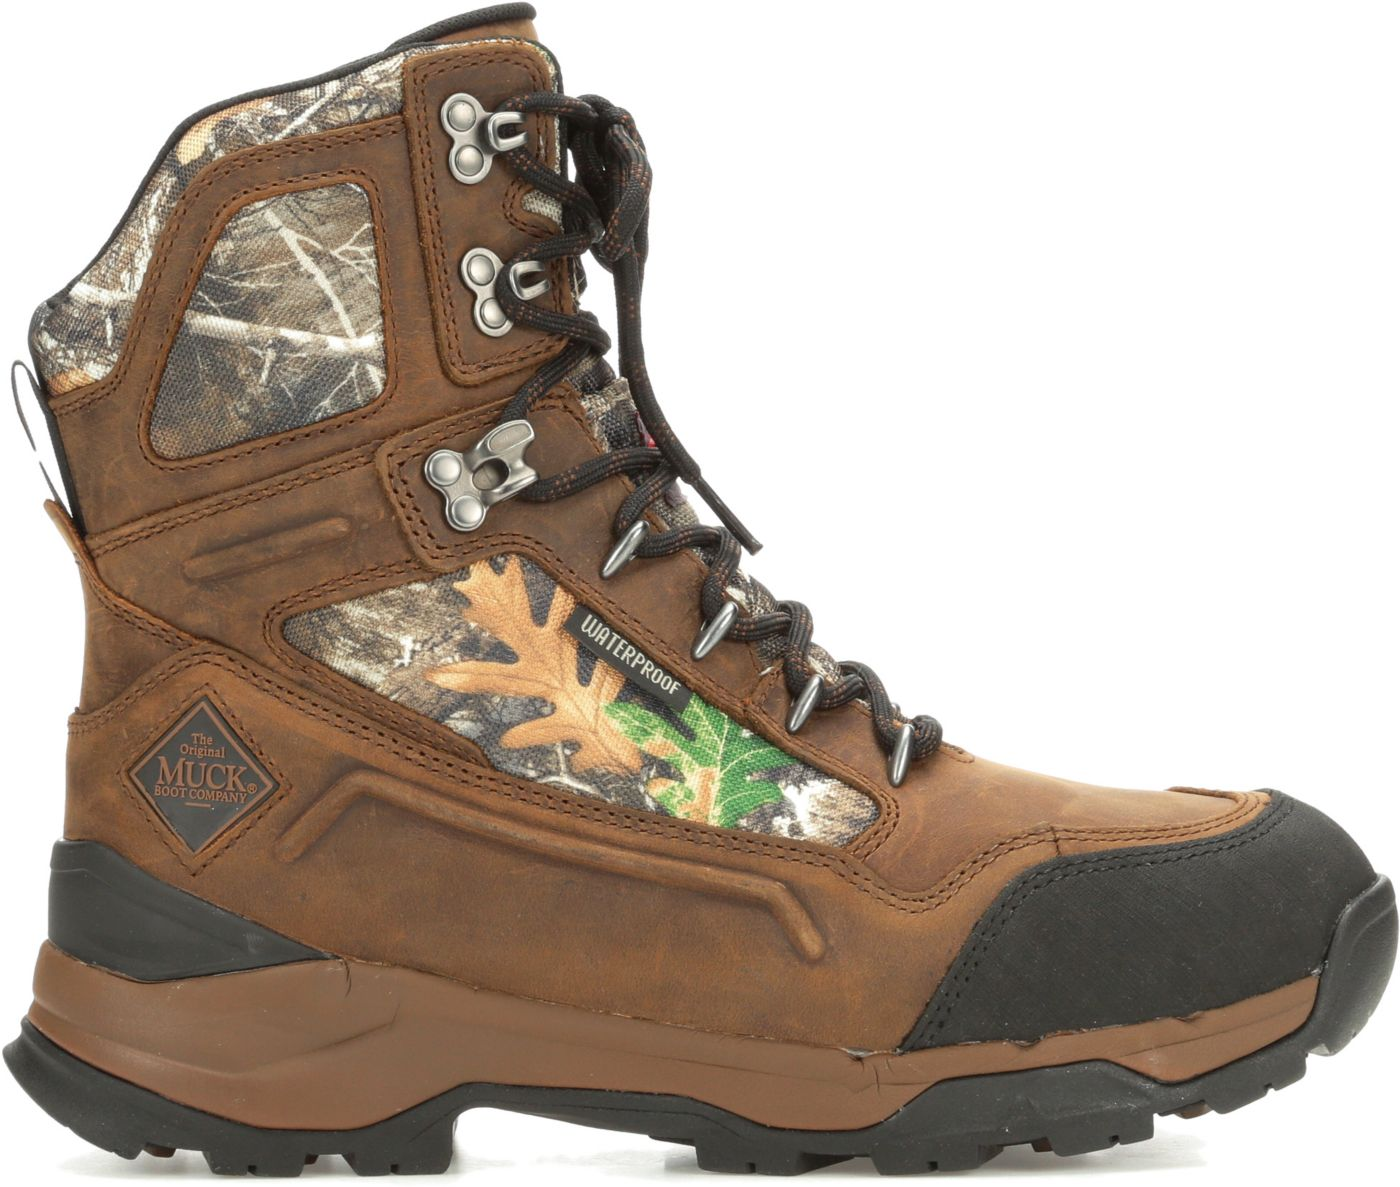 Muck Boots Men's Summit 10'' Realtree 800g Waterproof Field Hunting Boots